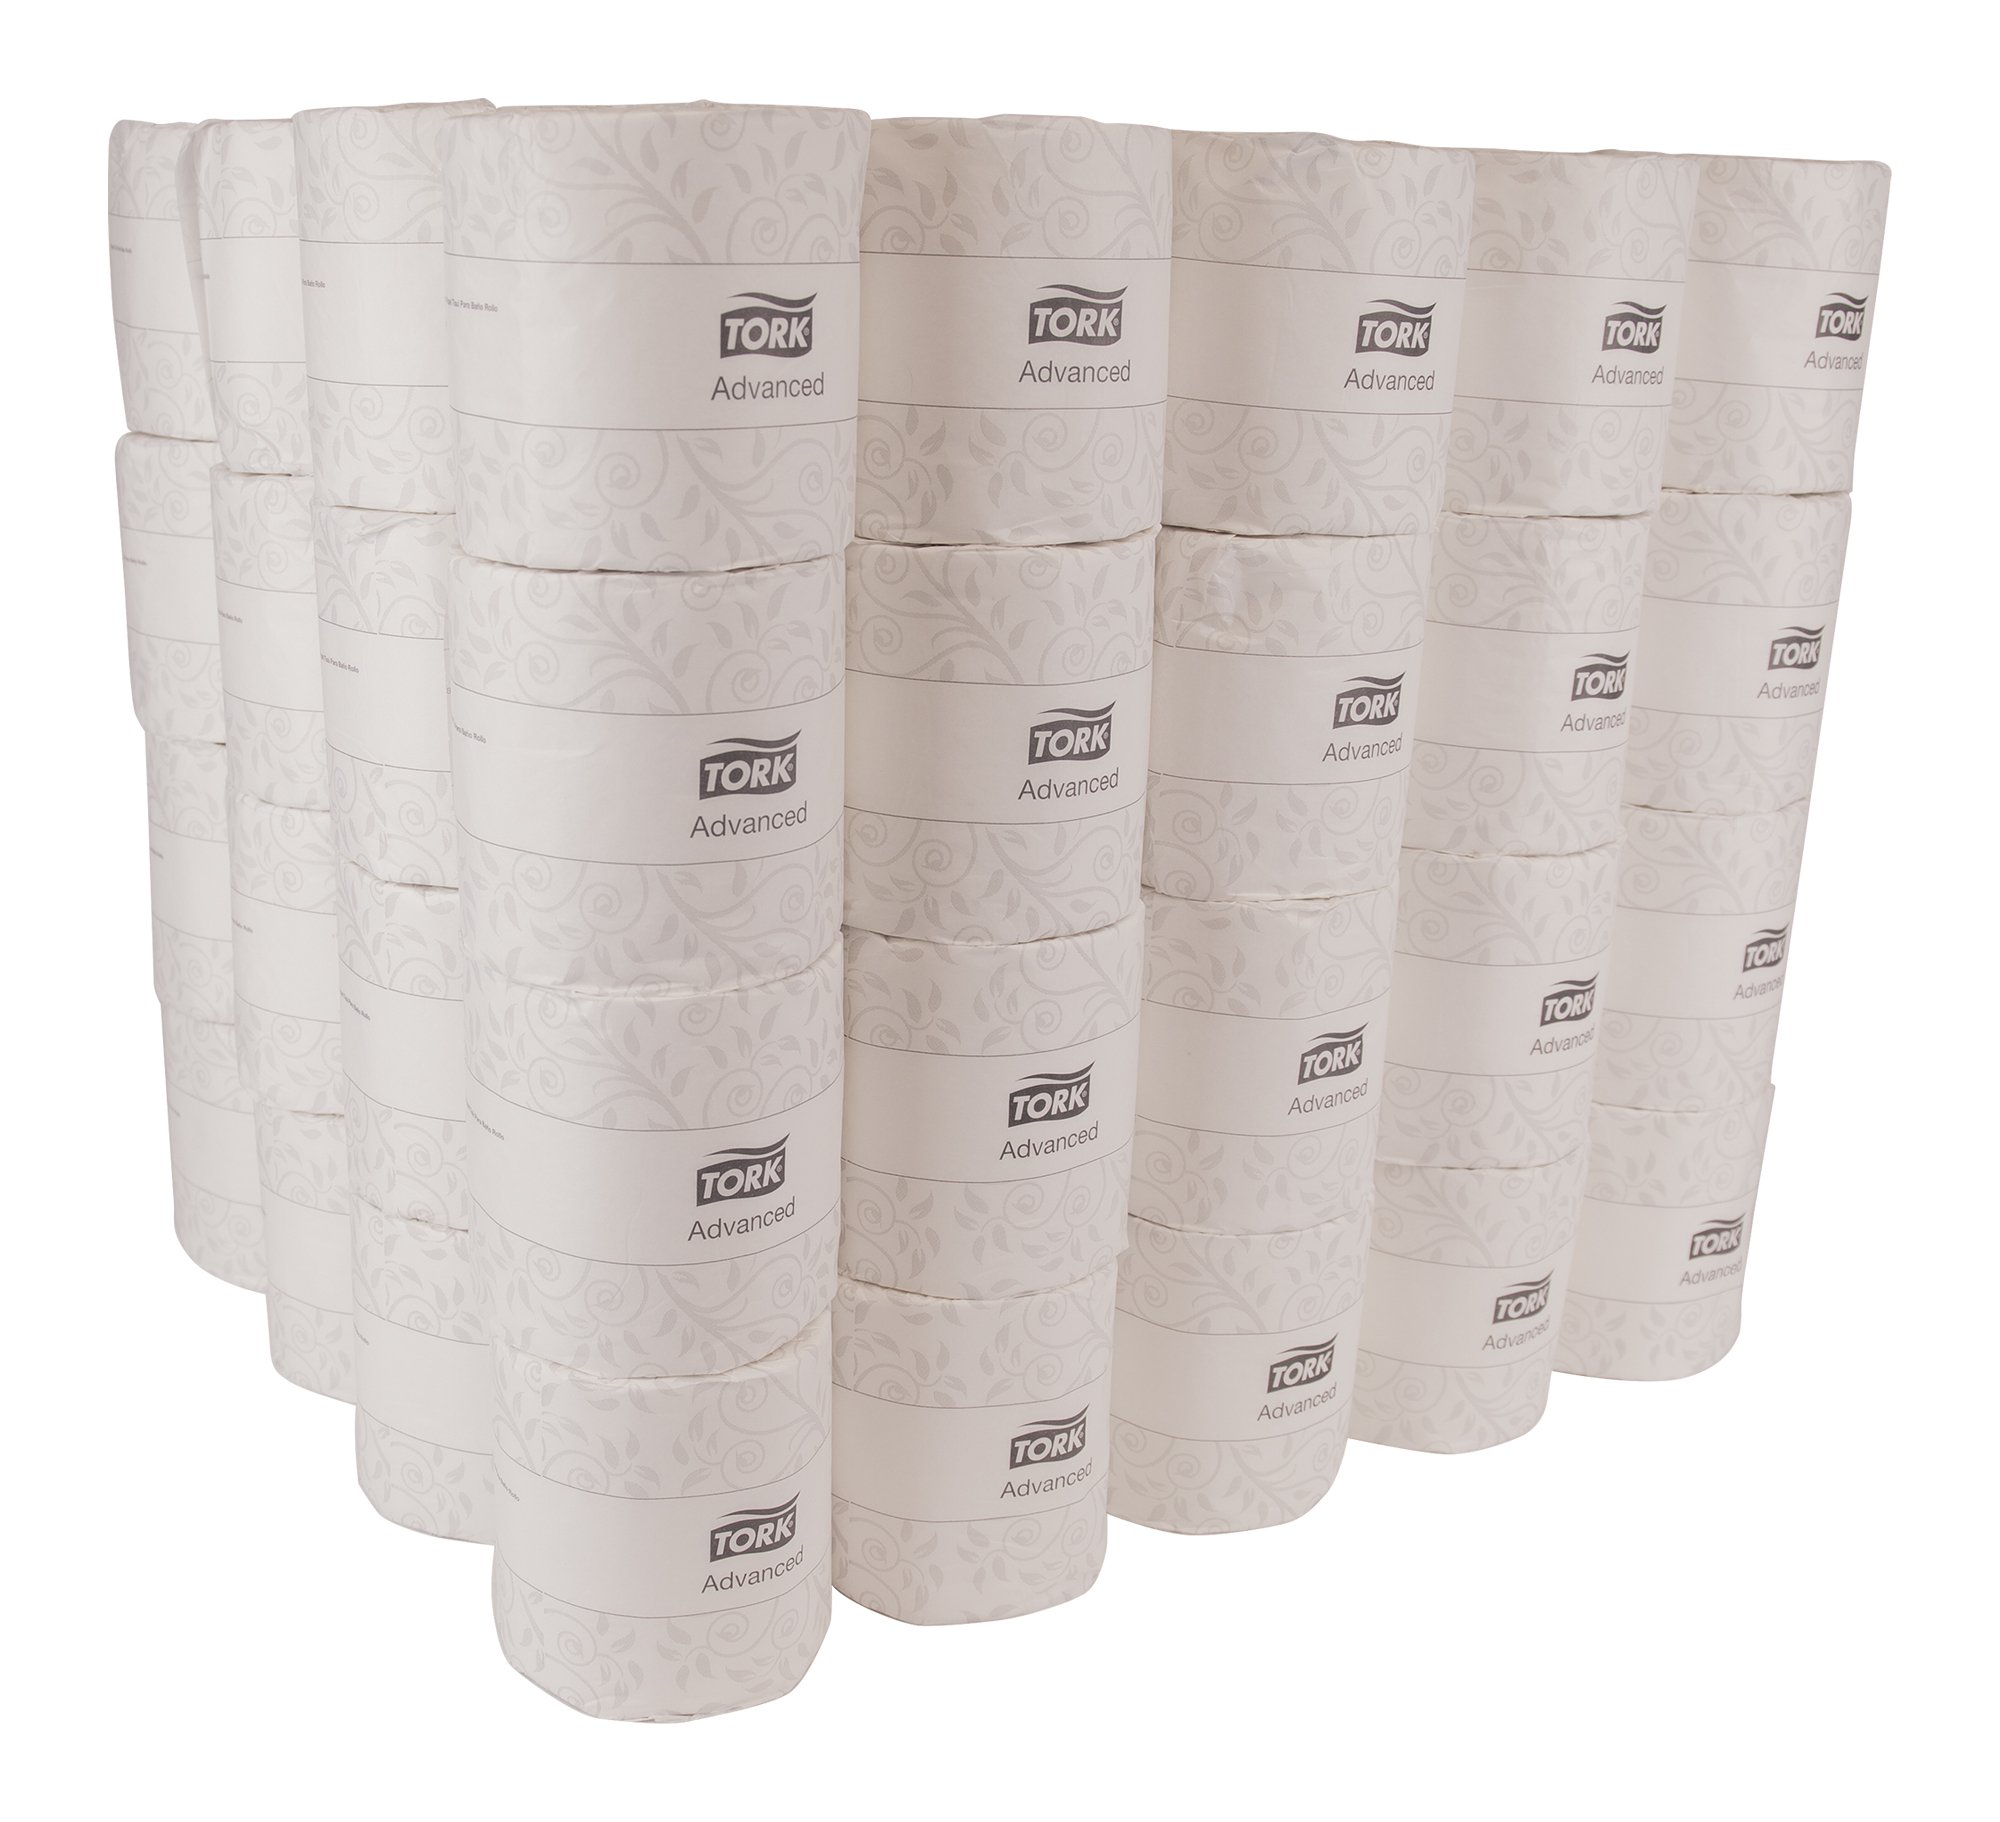 Tork Advanced TM6180 Soft Bath Tissue - 80 rolls